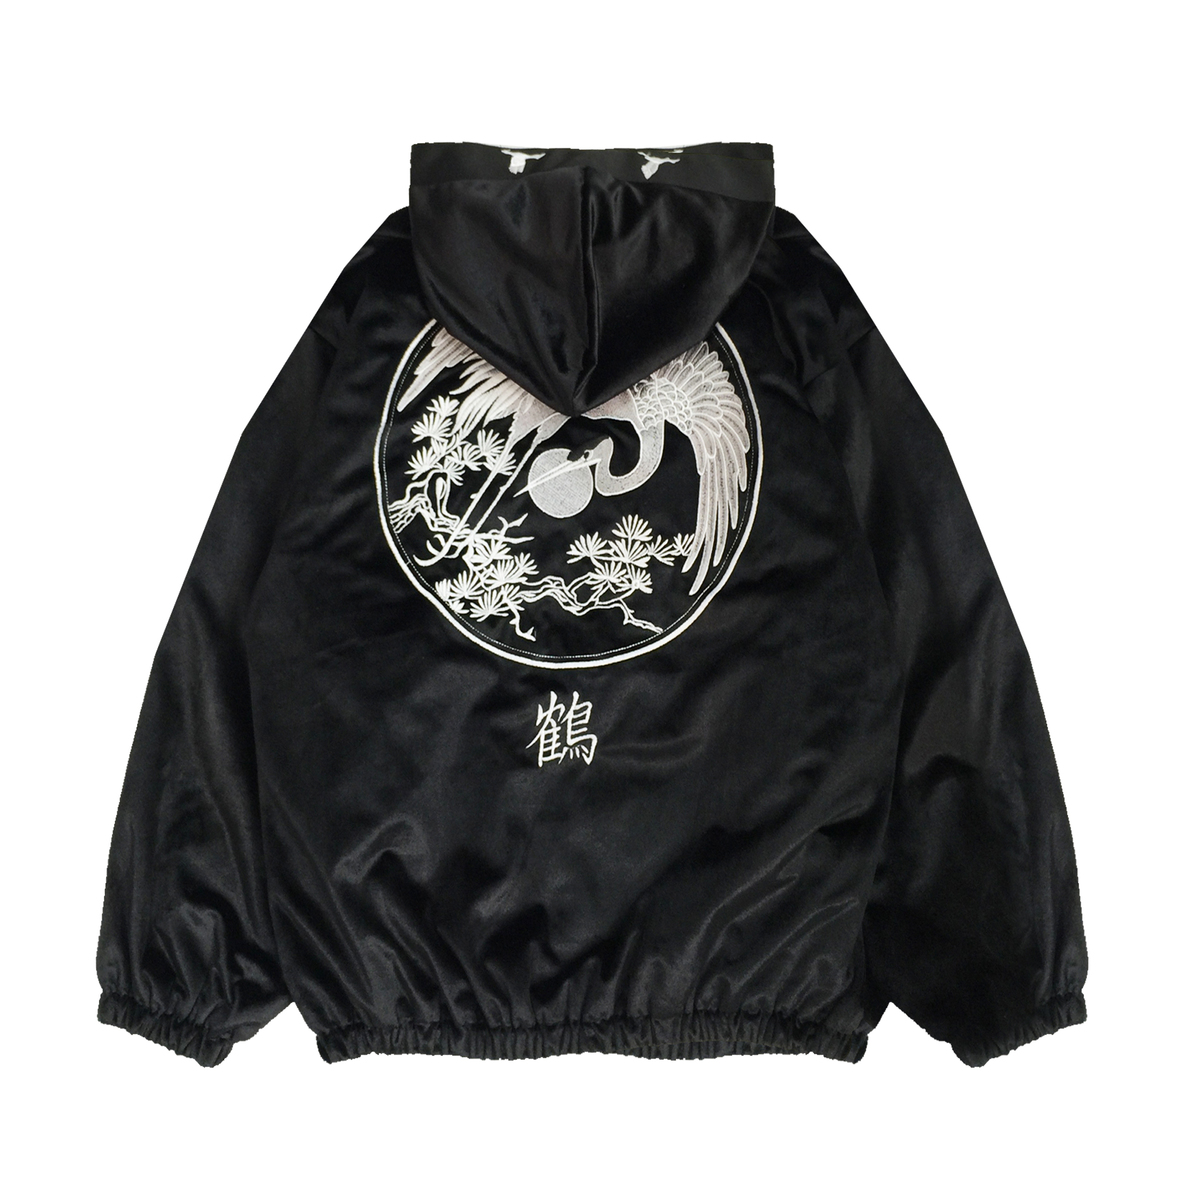 2017 New Vintage Fashion Harajuku Casual Embroidery Letter Velvet Zipper Loose Women Cotton Jacket